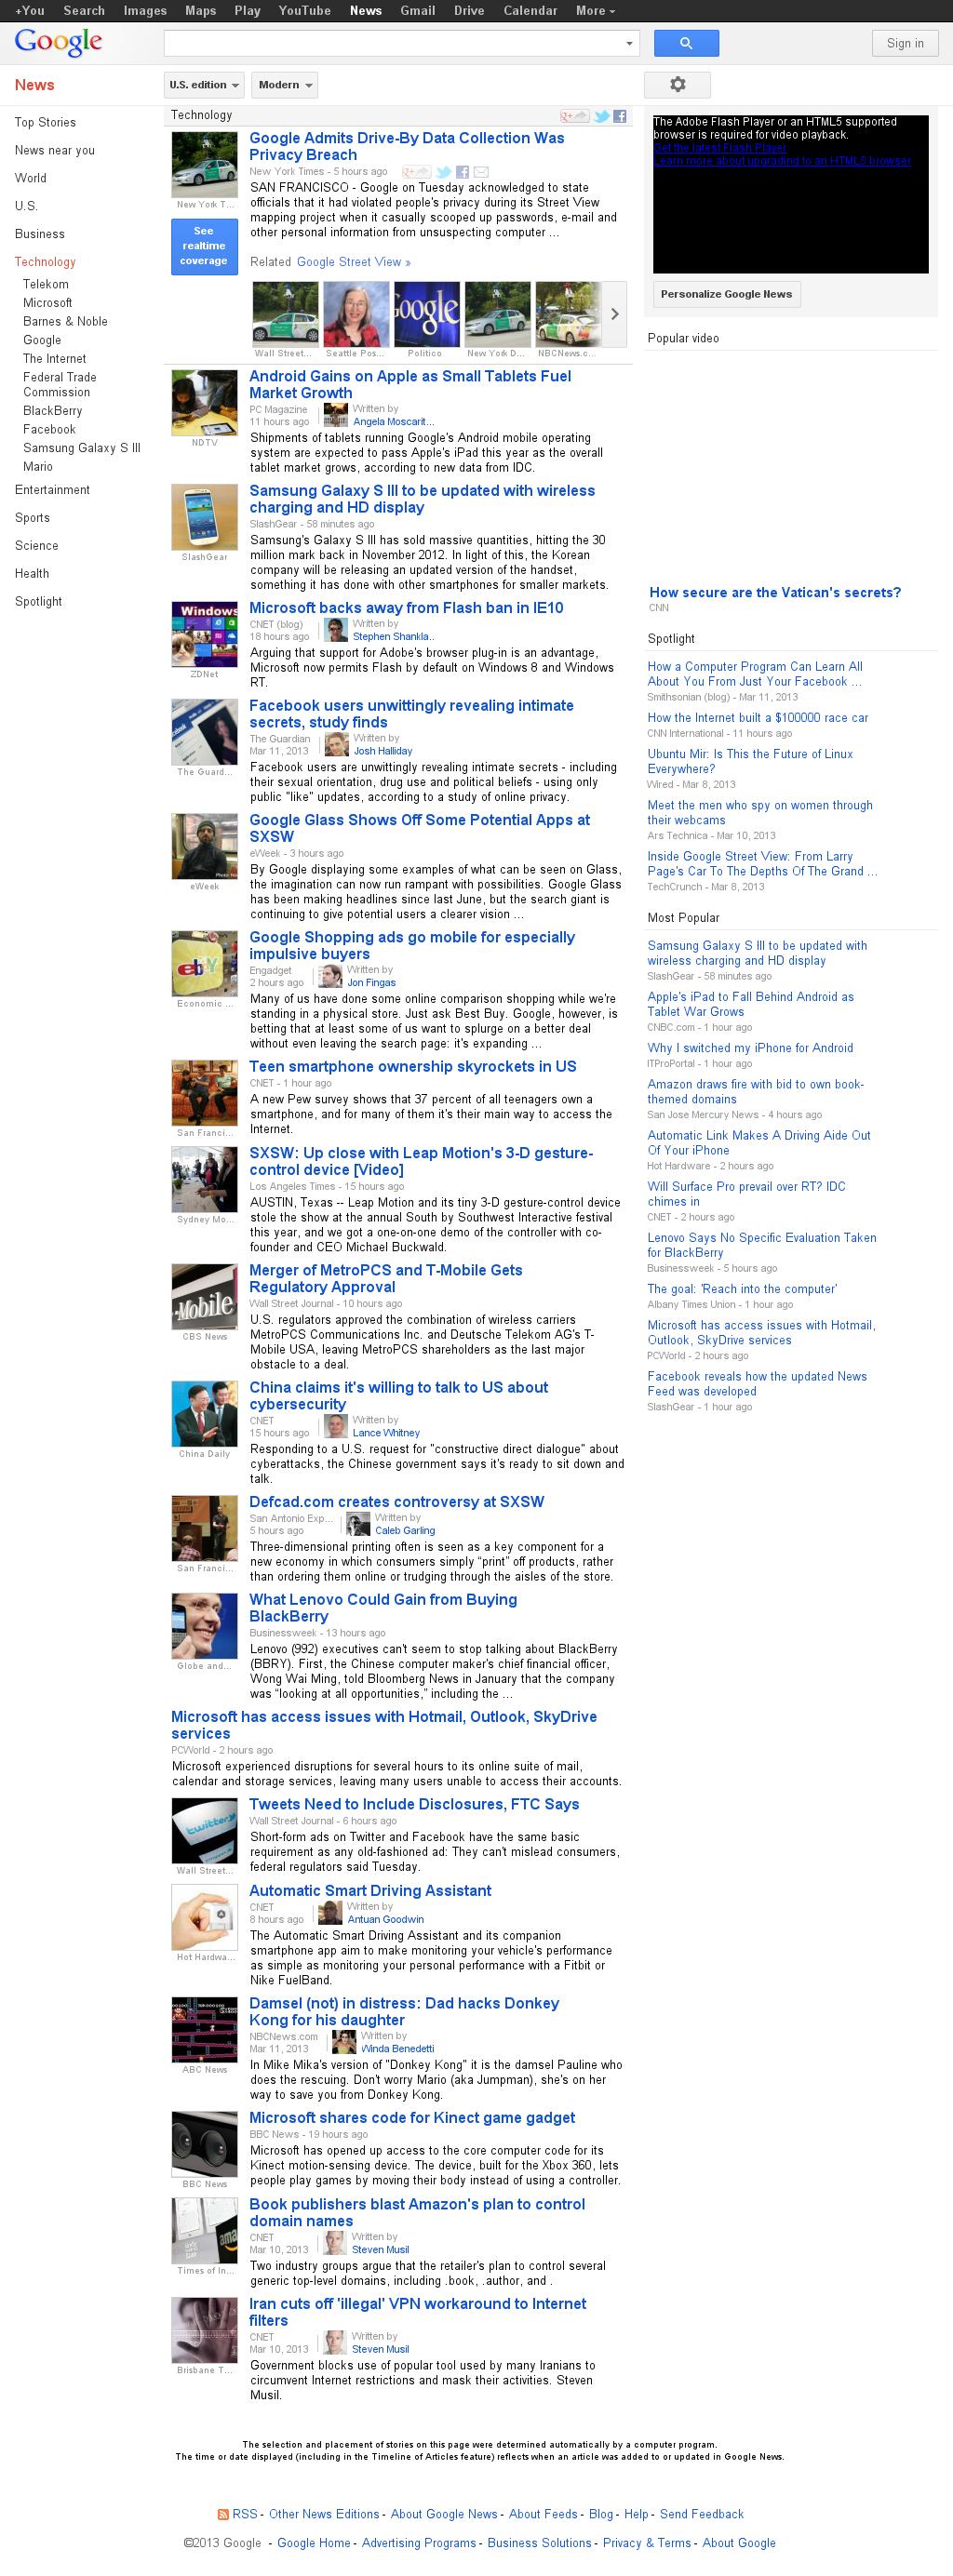 Google News: Technology at Wednesday March 13, 2013, 7:08 a.m. UTC